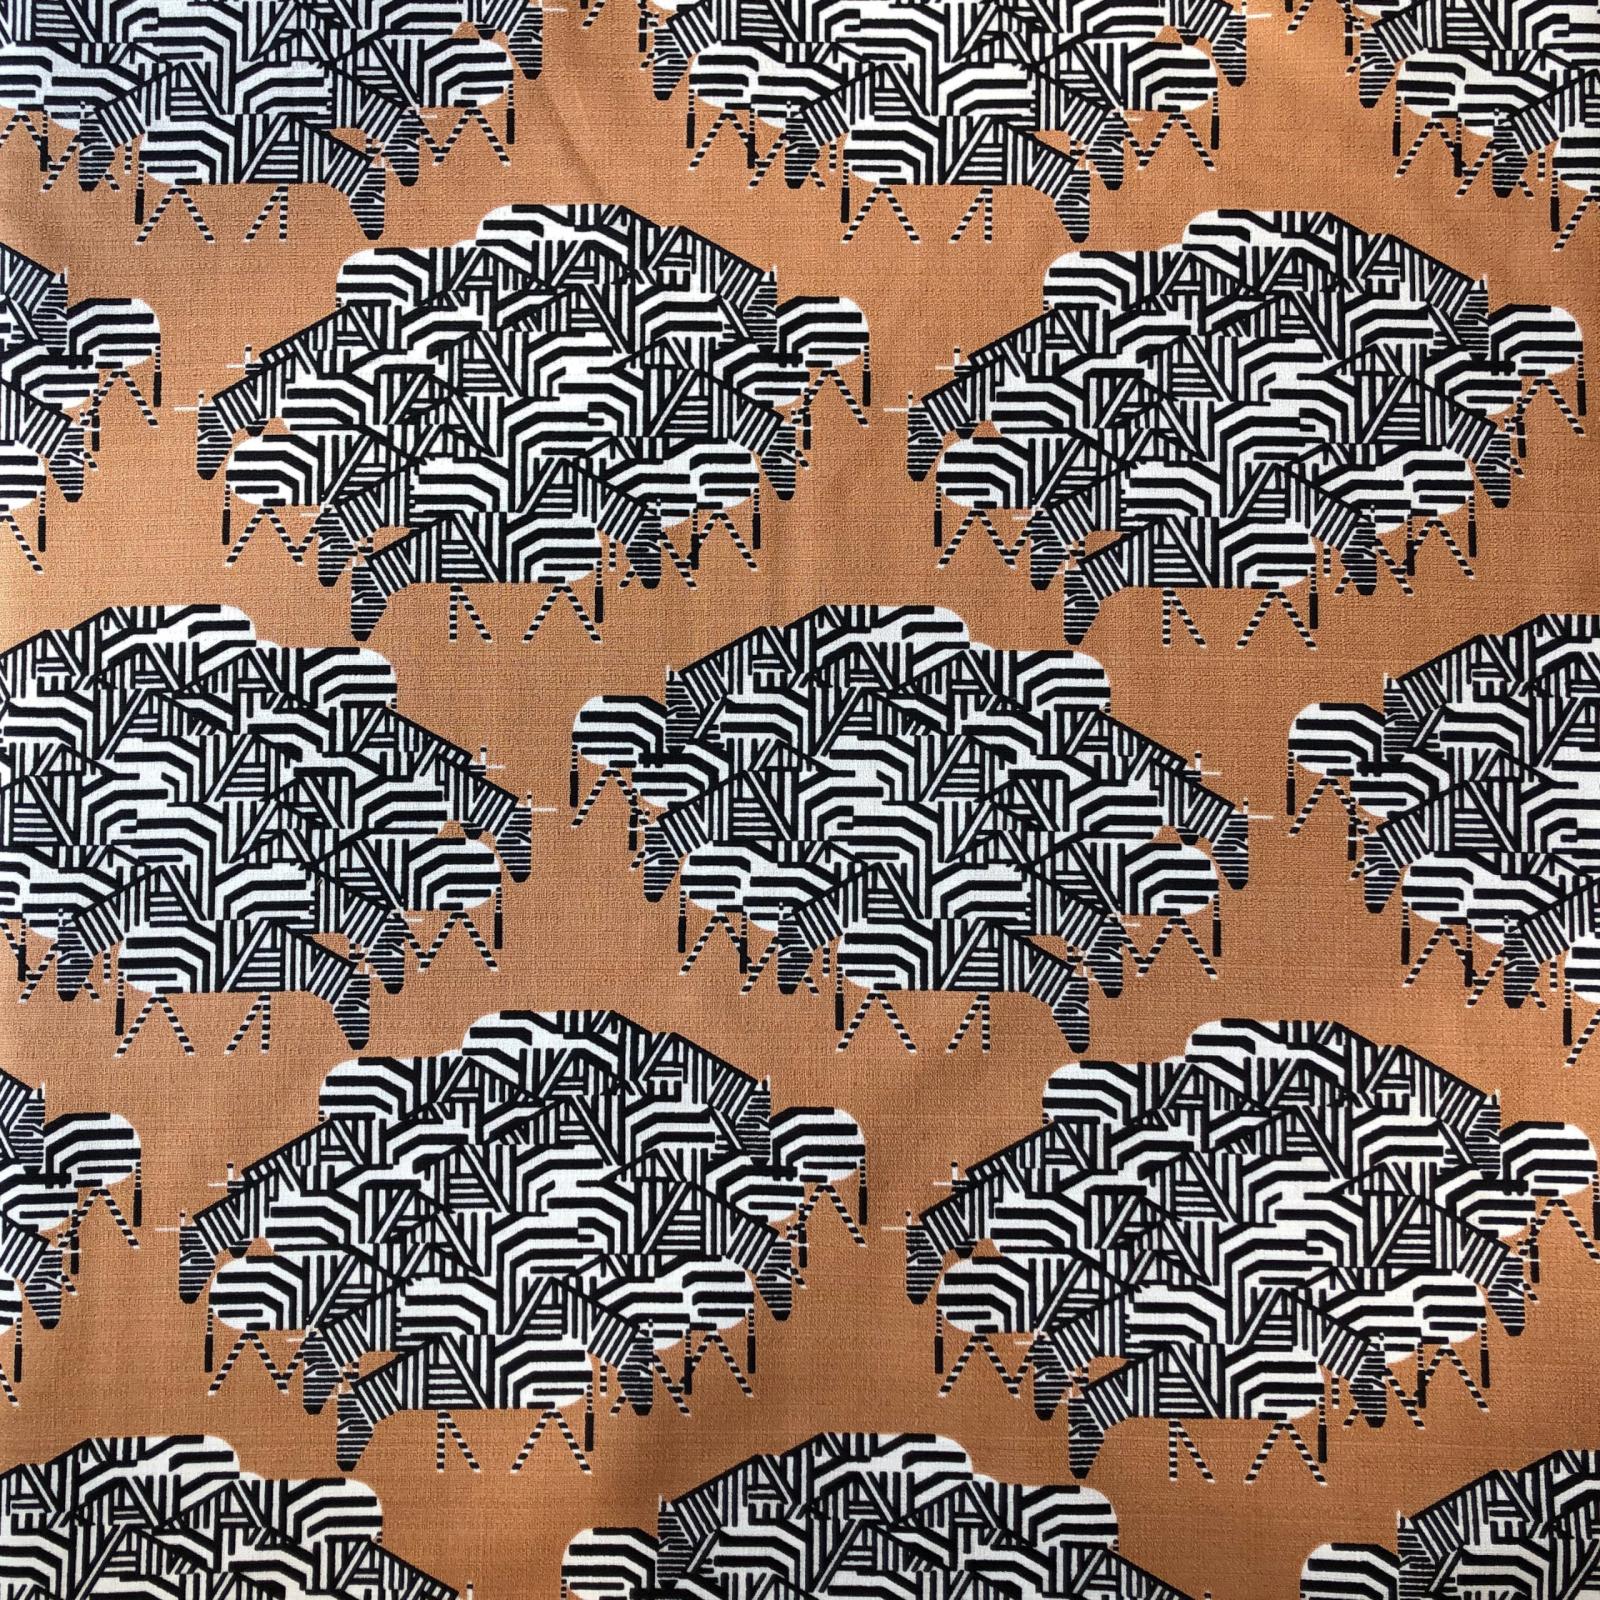 Charley Harper Organic Barkcloth - Serengeti Spaghetti 58